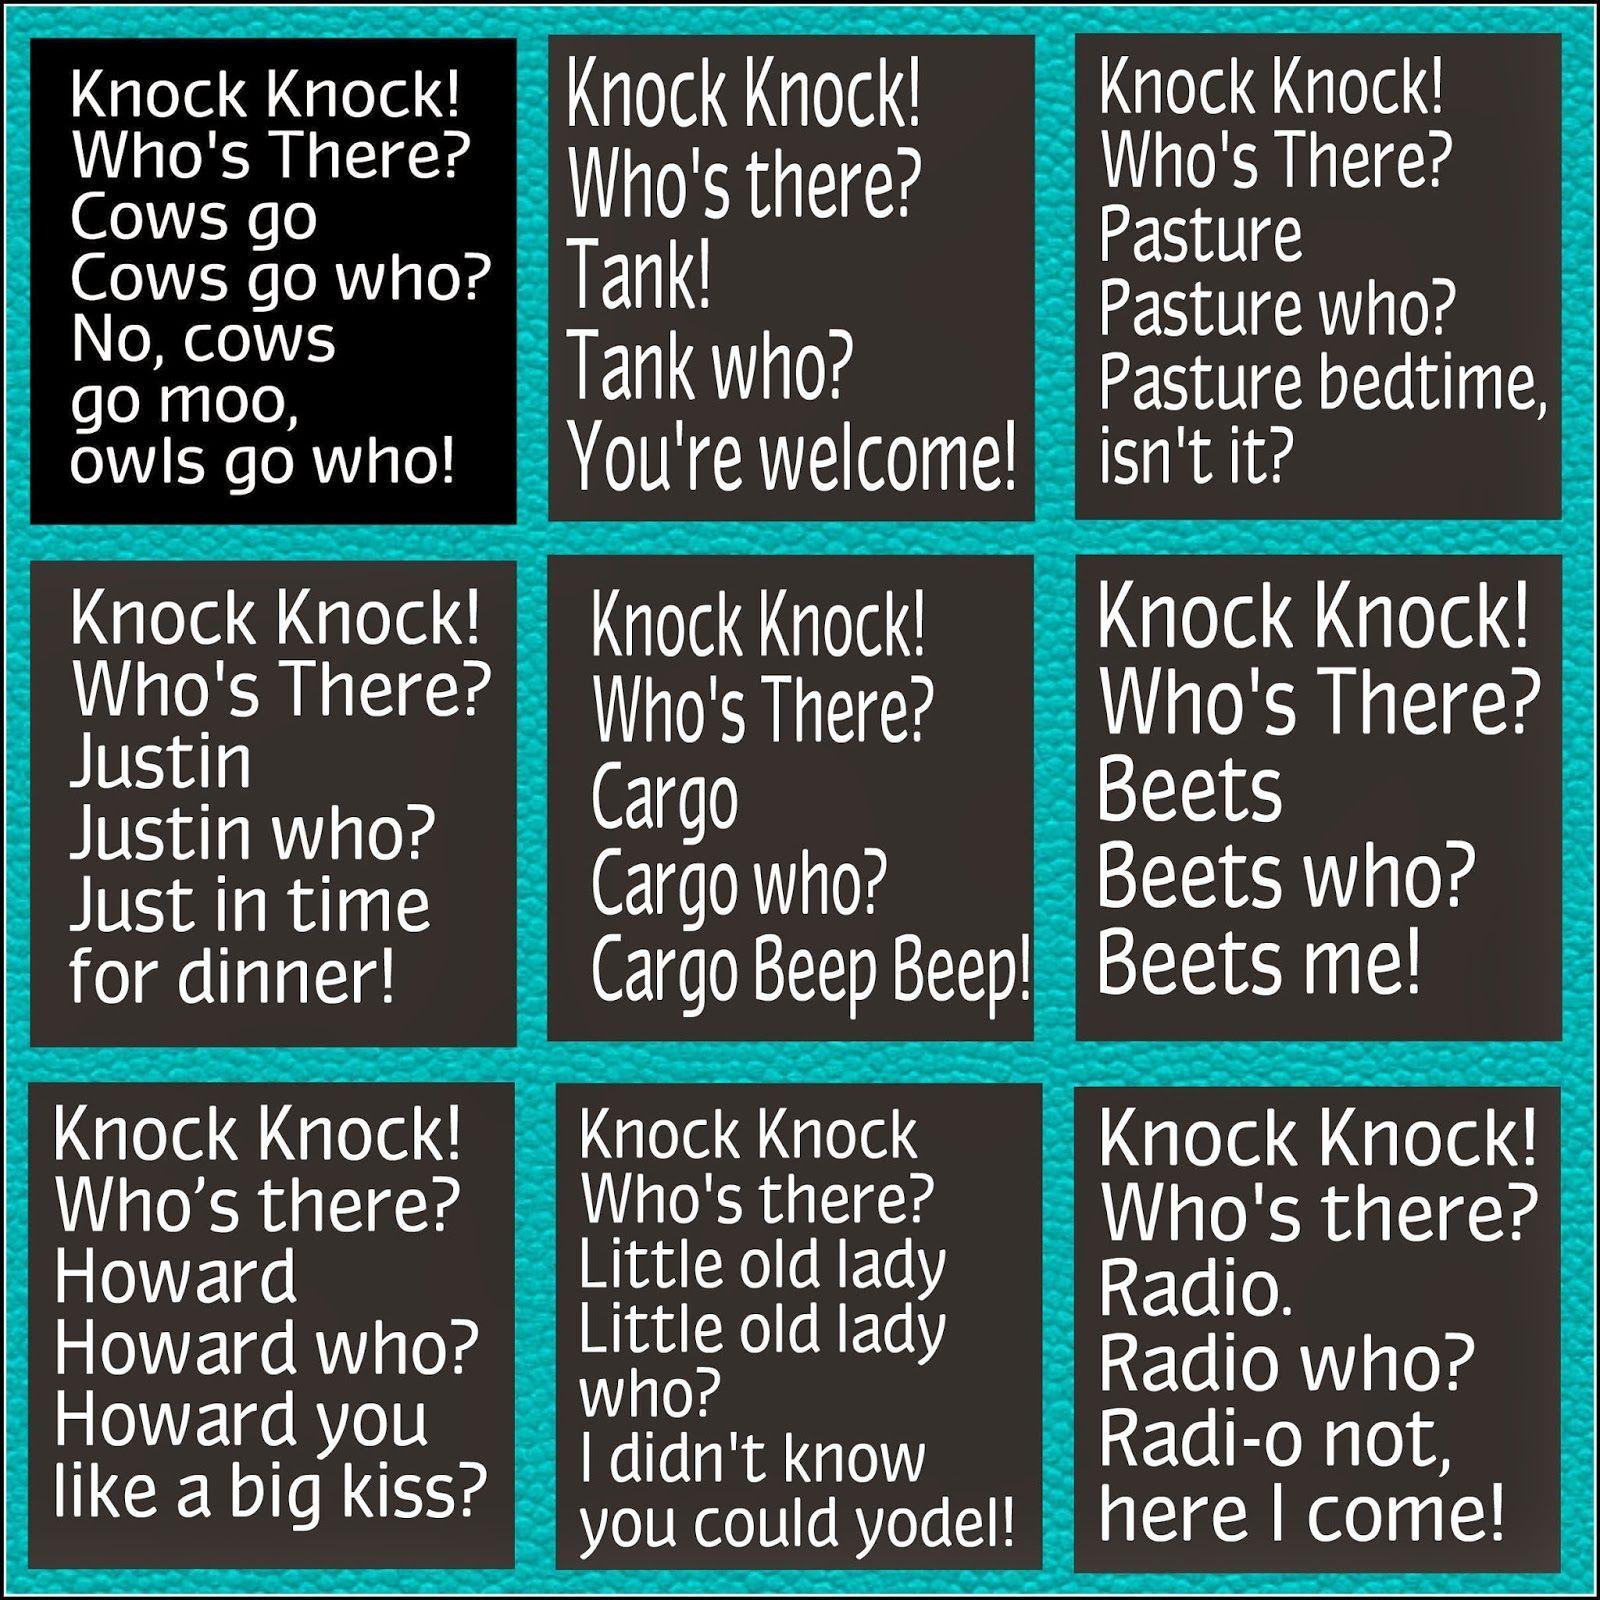 Knock Knock Jokes Fun When You Re Young Funny Jokes For Kids